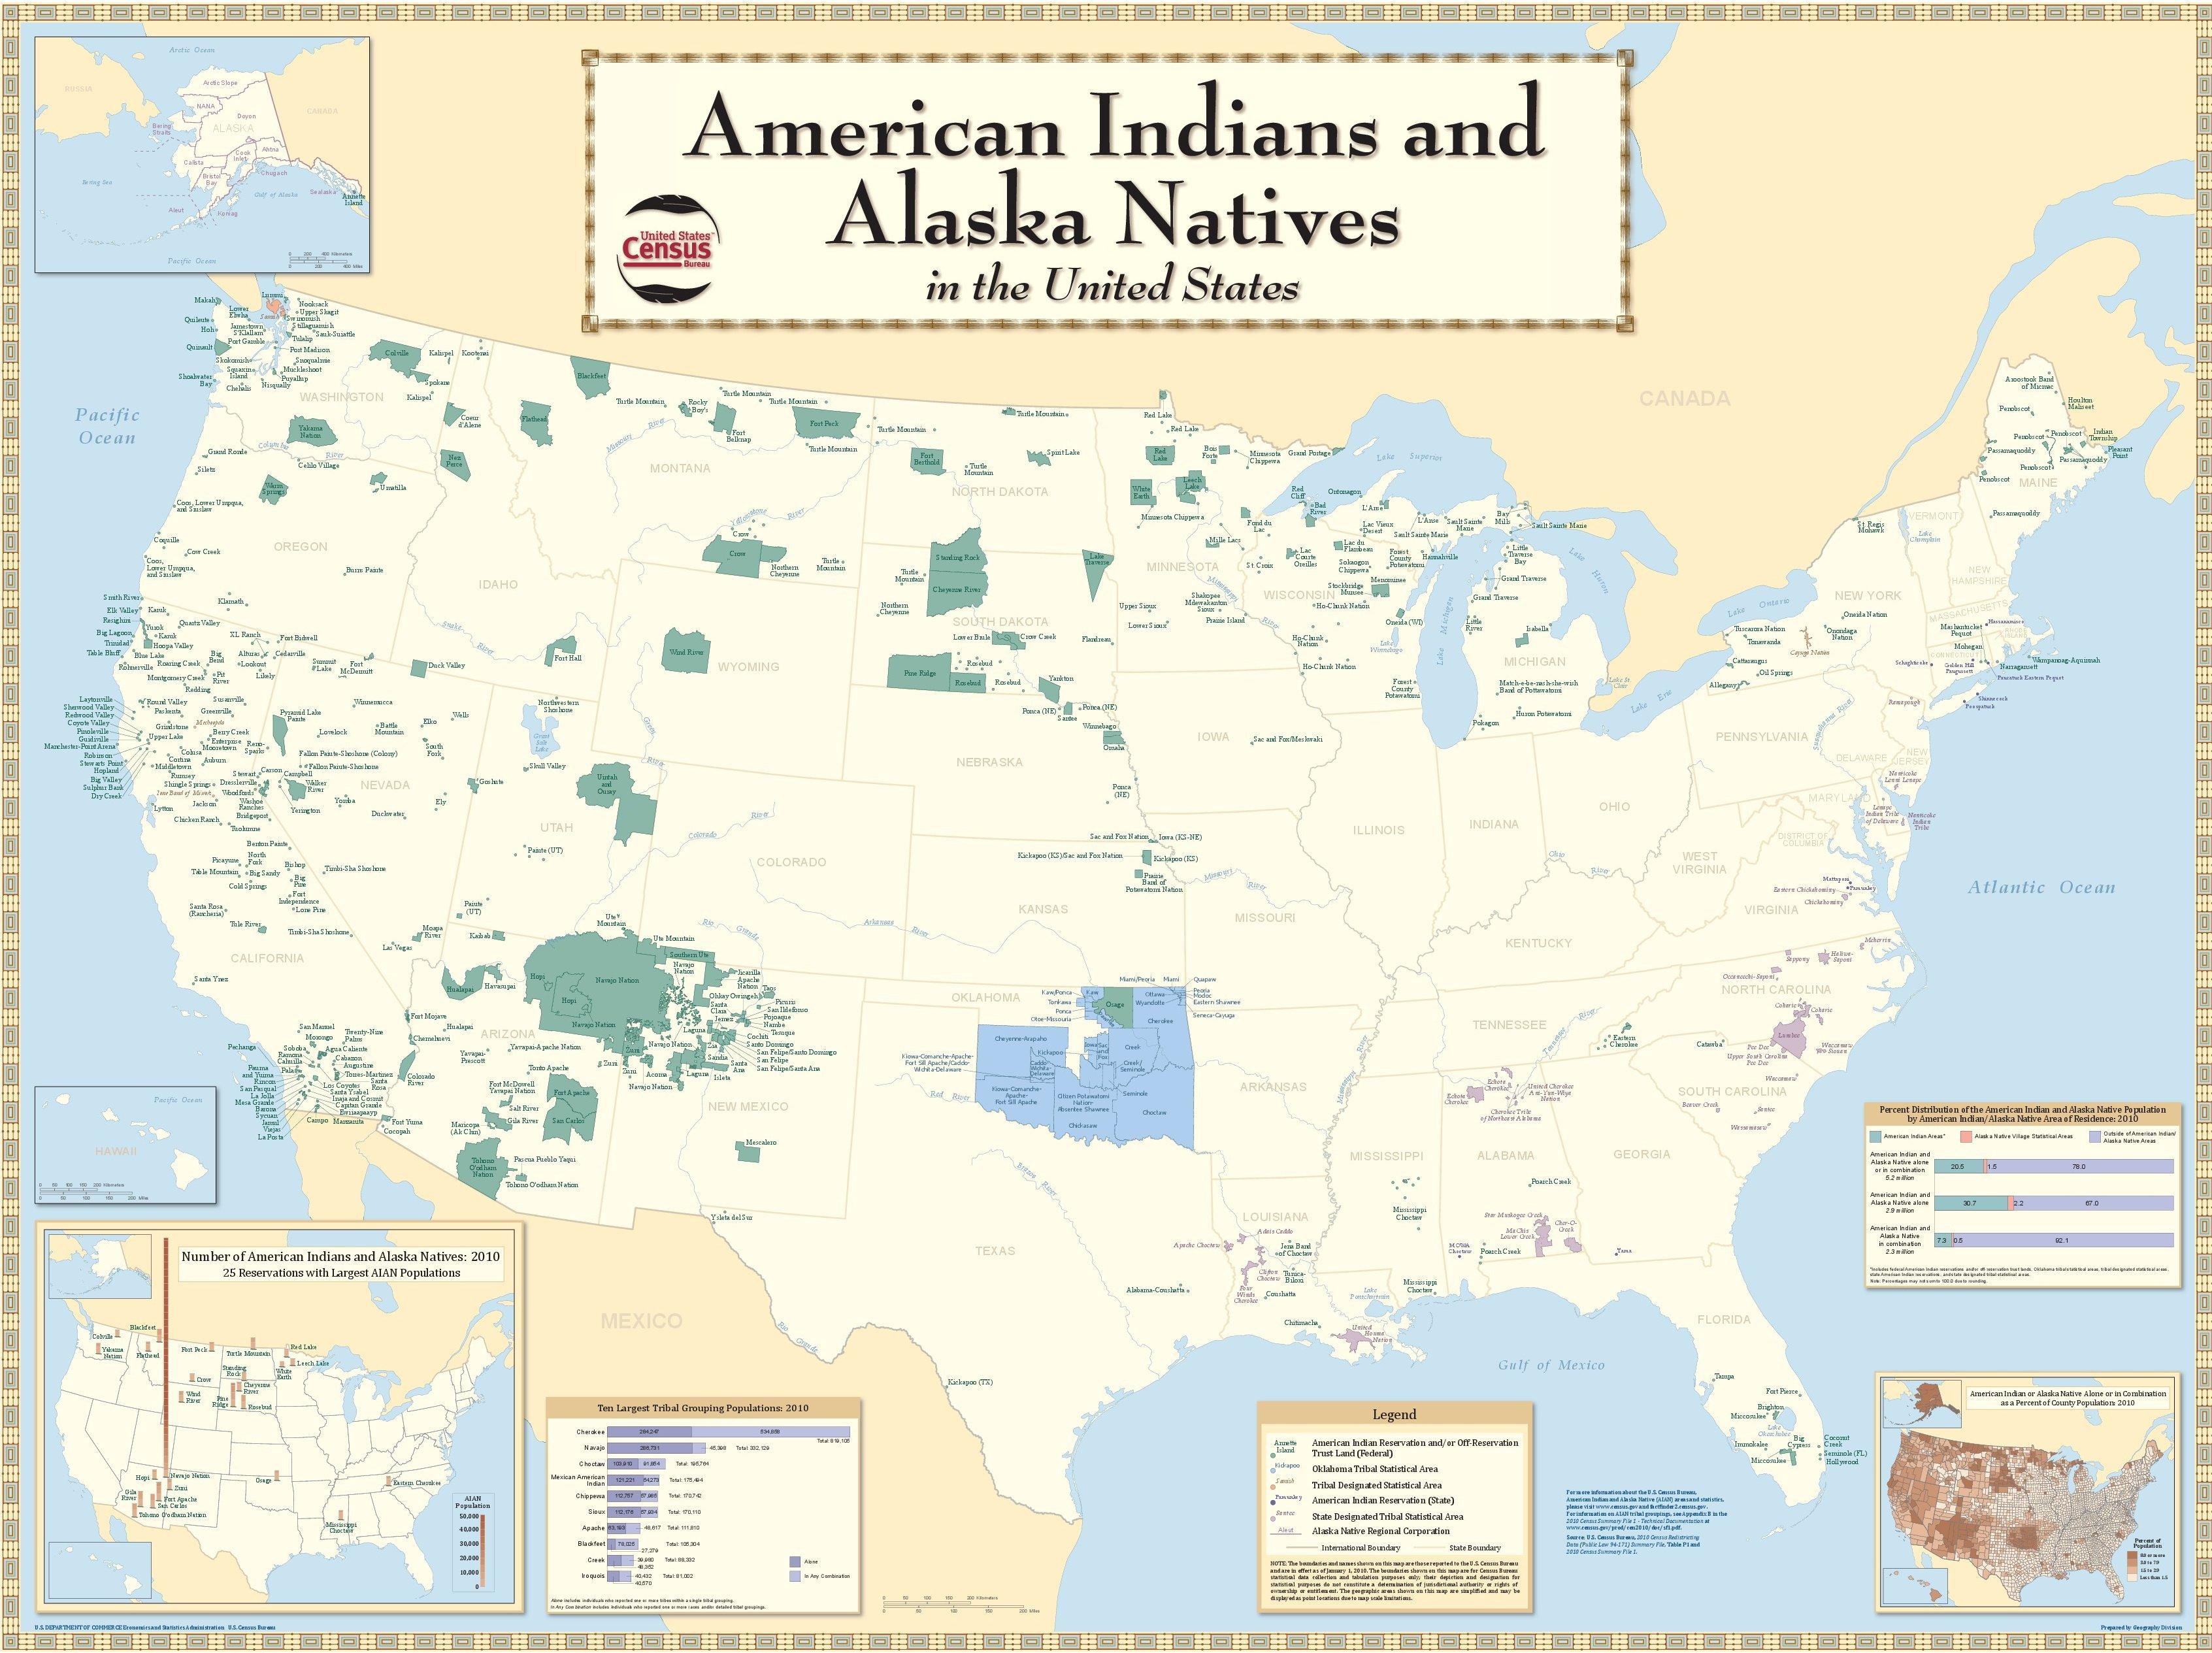 Tribu Indienne Carte.Carte Detaillee Des Reserves Indiennes D Aujourd Hui